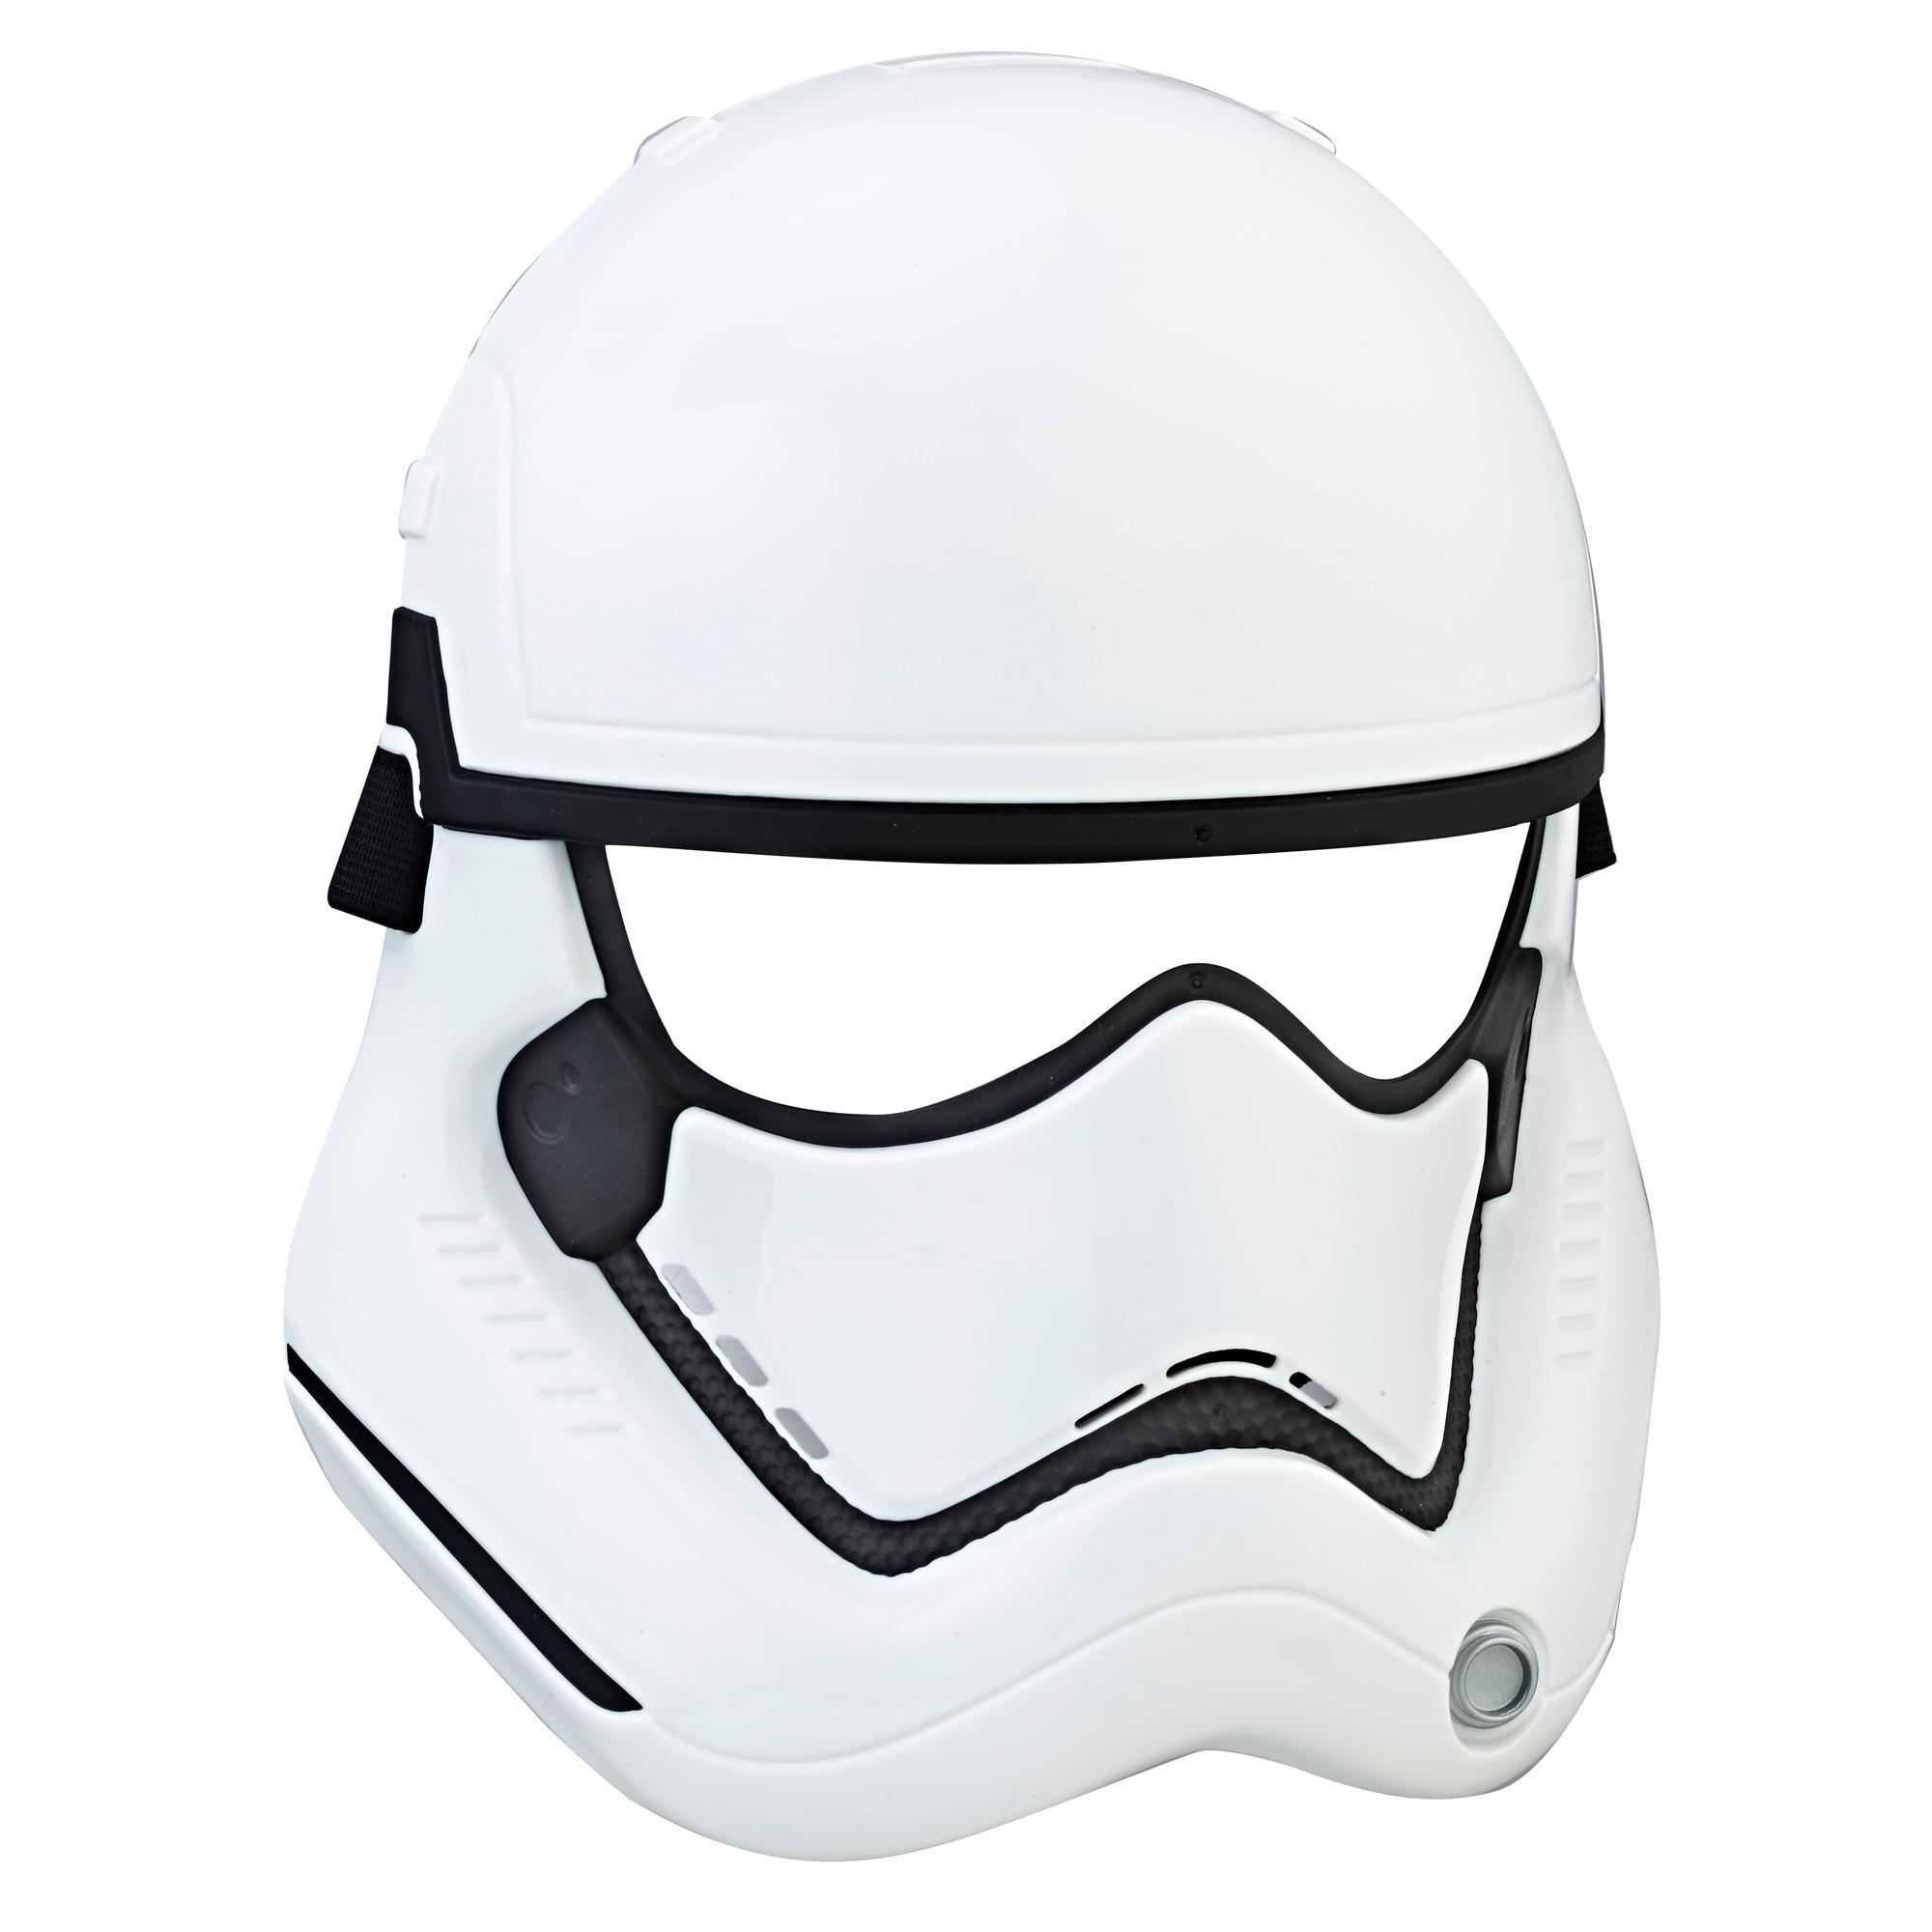 Star Wars Episode 8 Masken First Order Storm Trooper